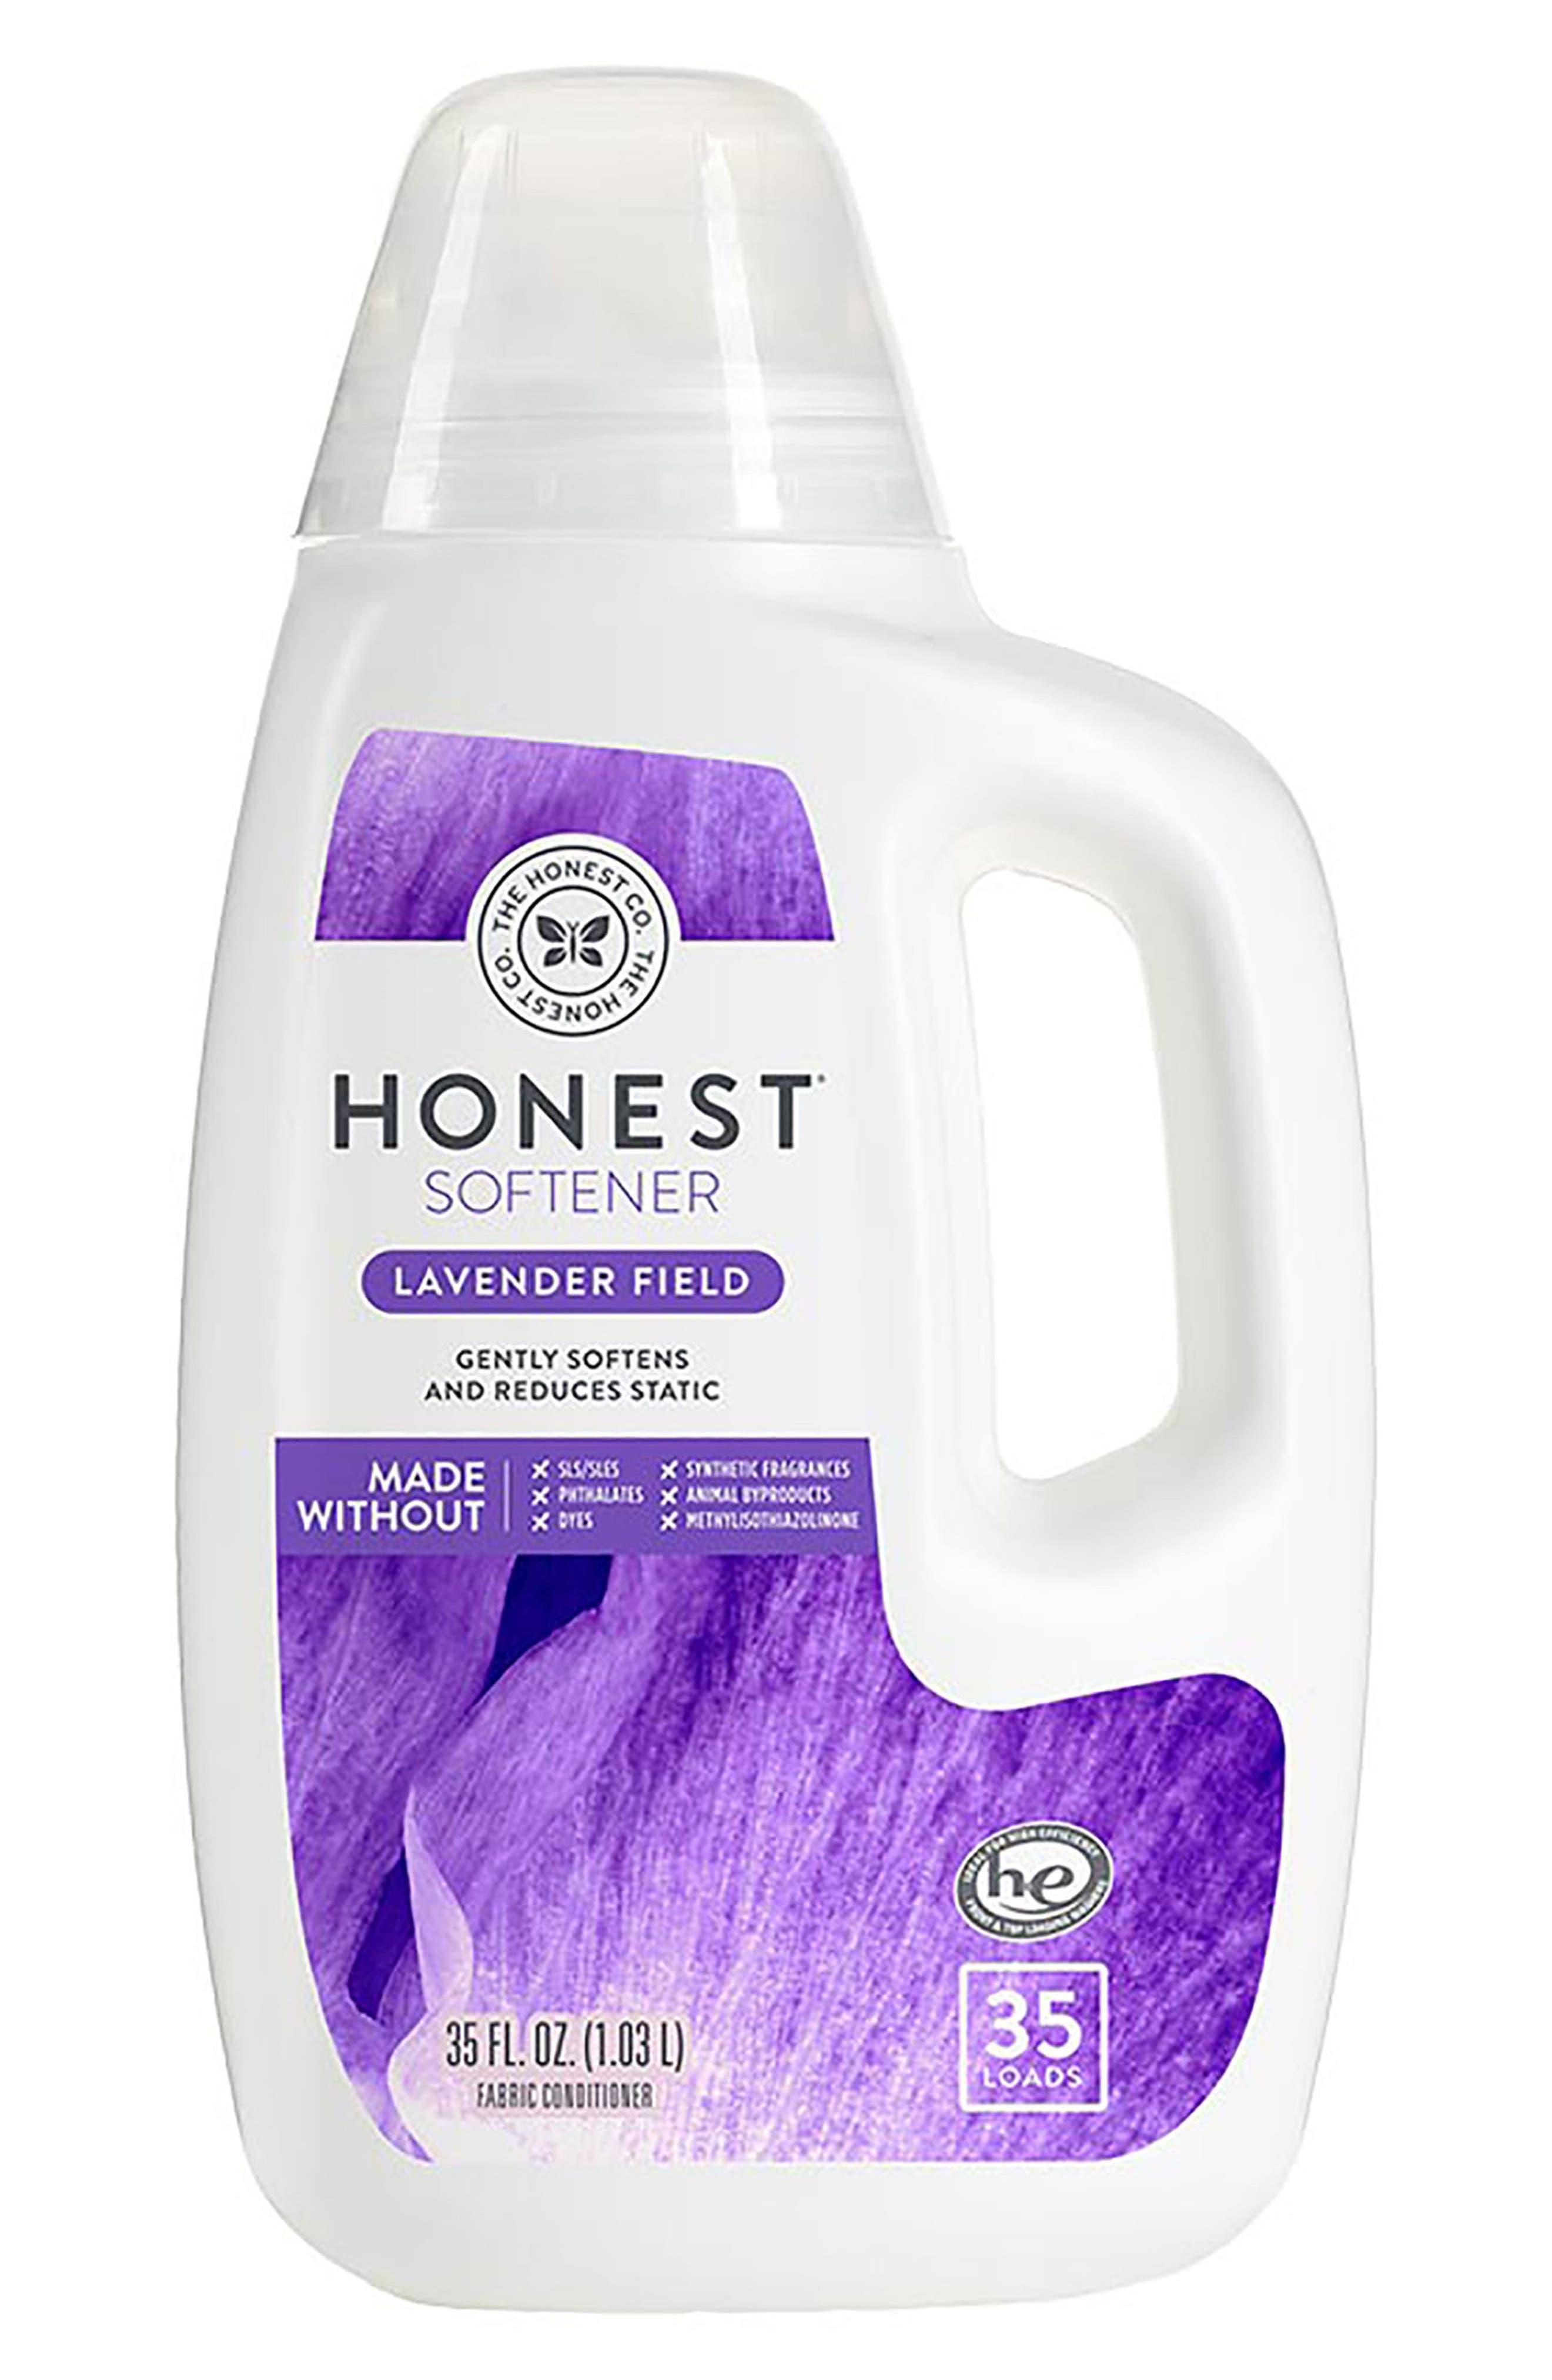 THE HONEST COMPANY Lavender Field Fabric Softener, Main, color, 500